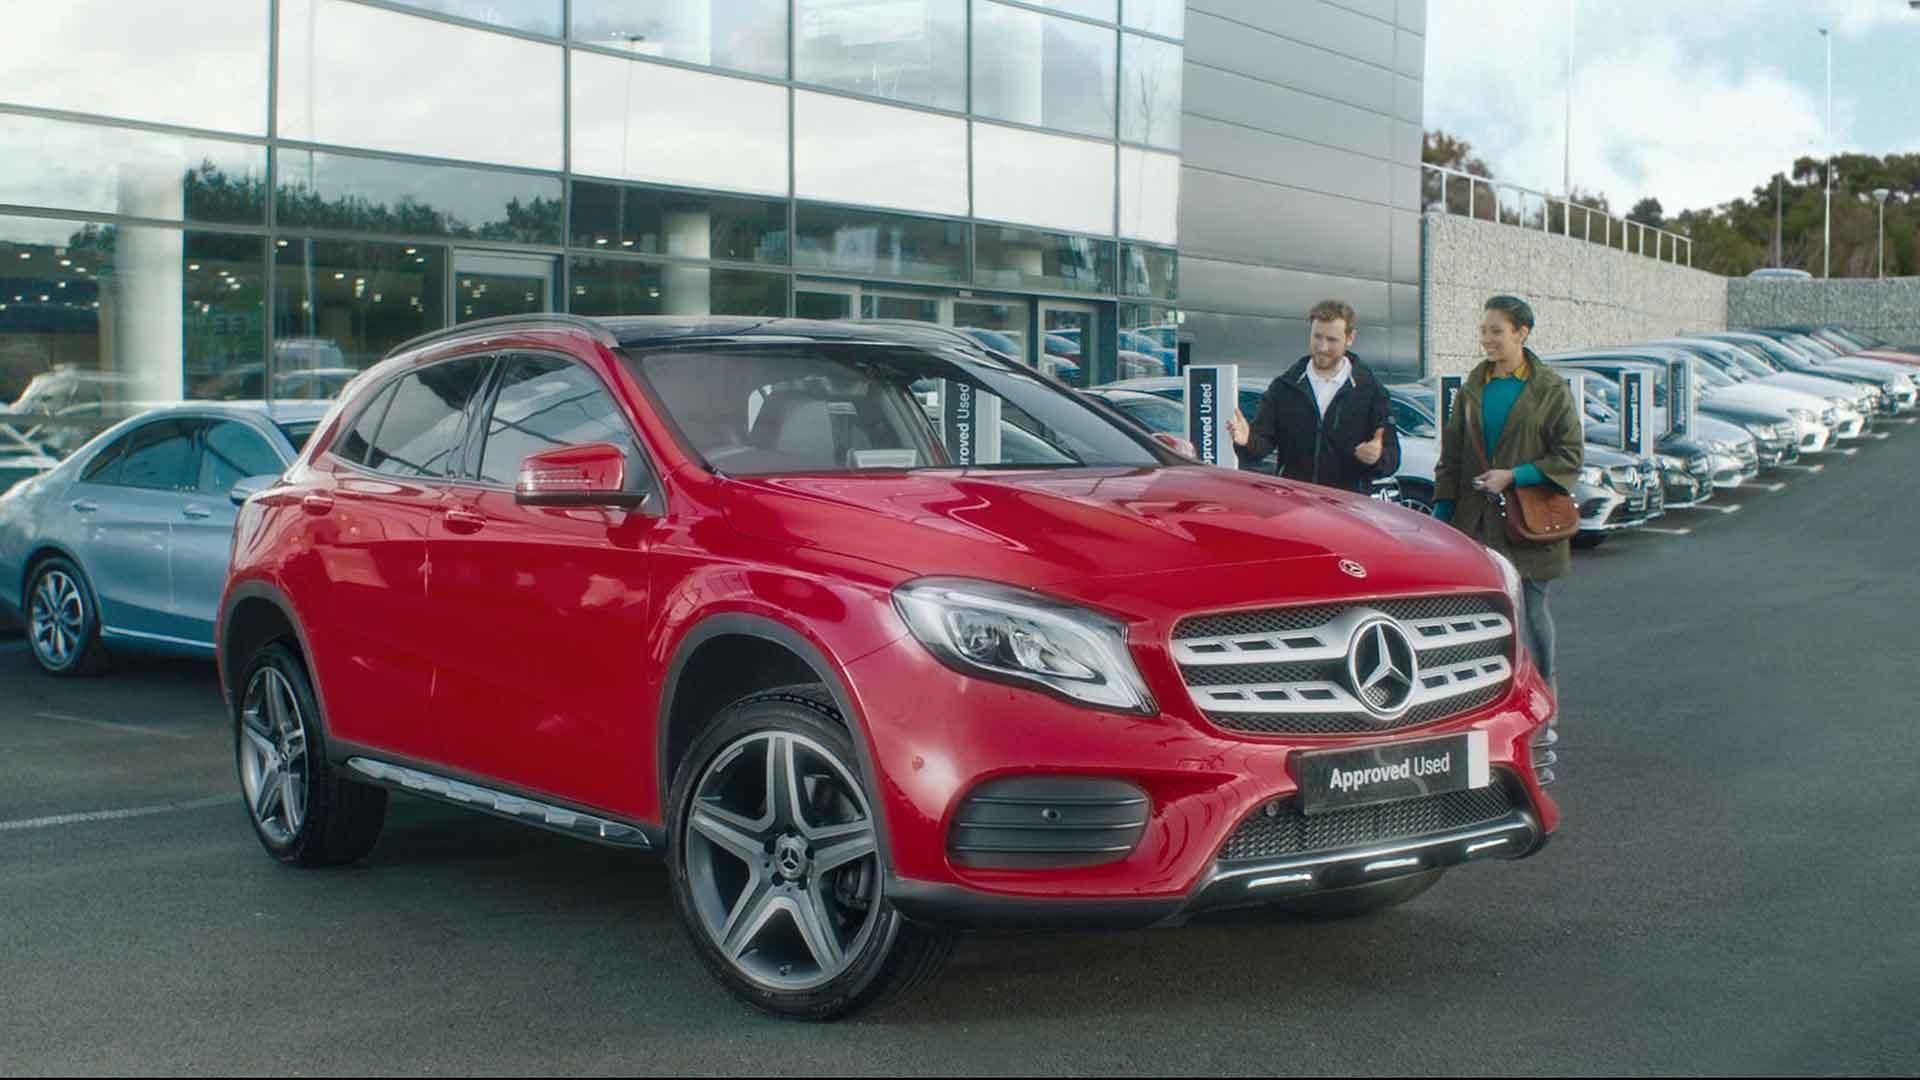 Mercedes-Benz used car sales